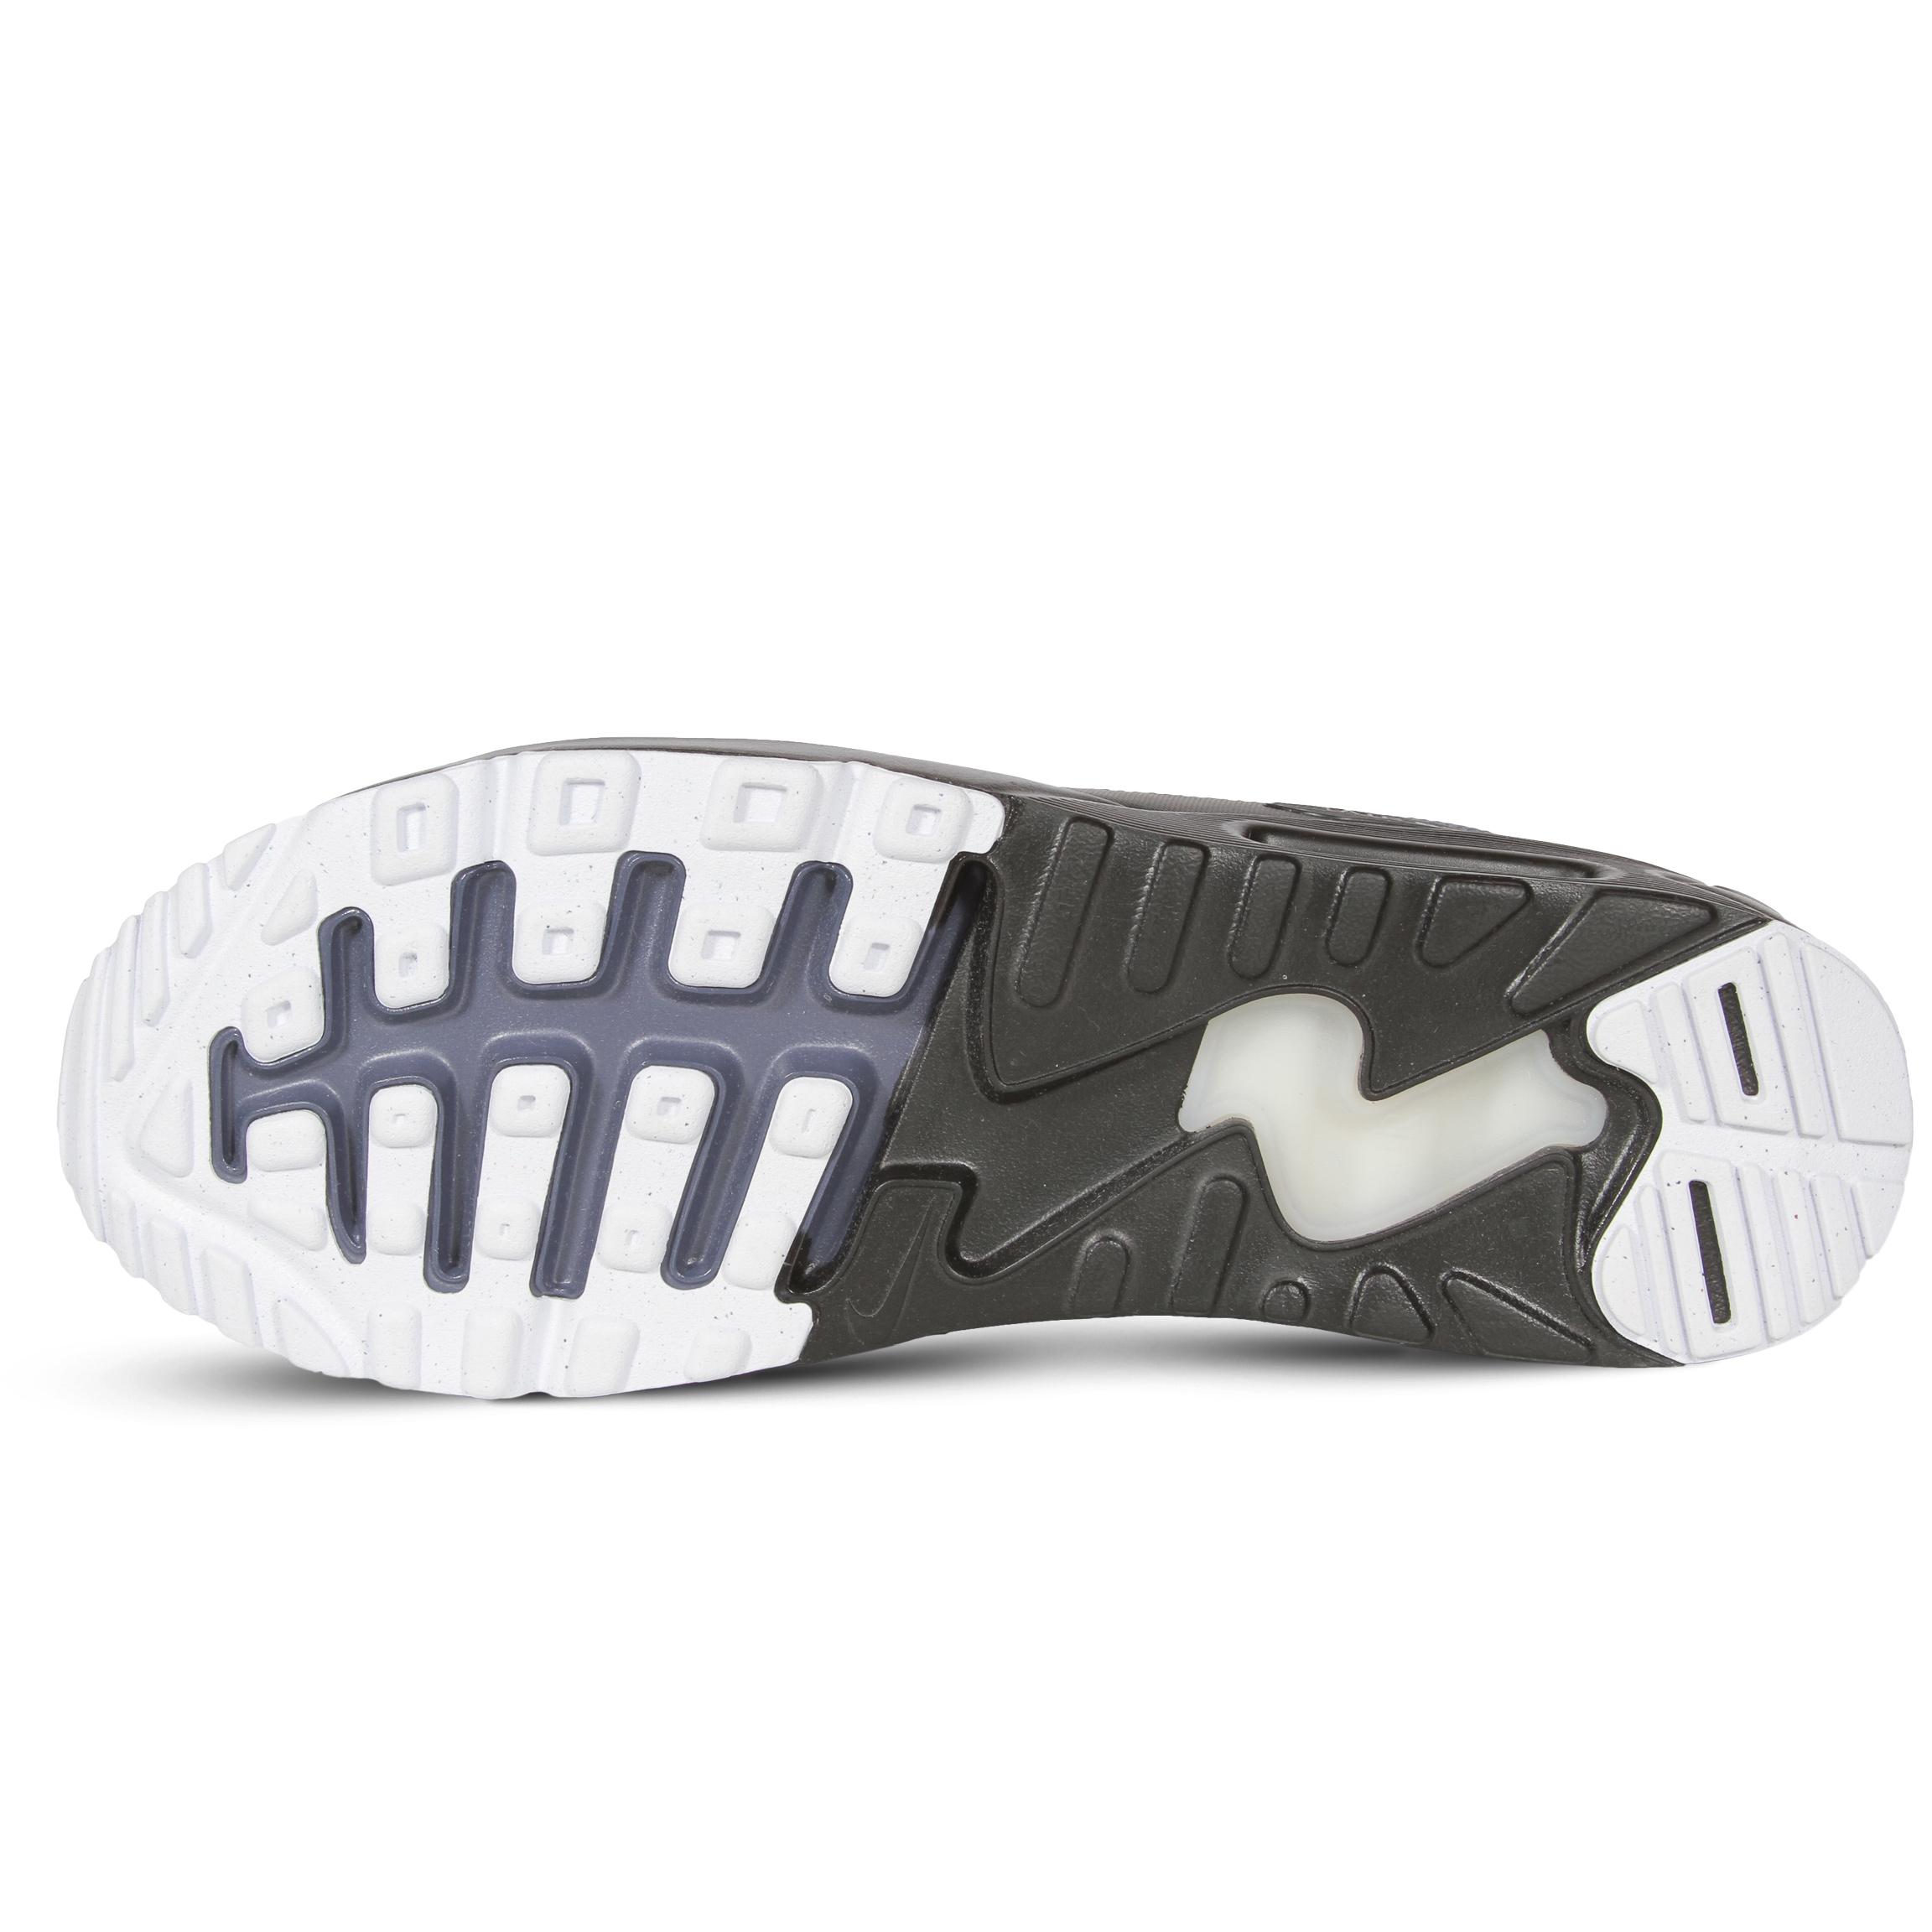 Mens Nike Air Max 90 Pas Cher Uniformes Postaux Noirs AfSm4EwKK